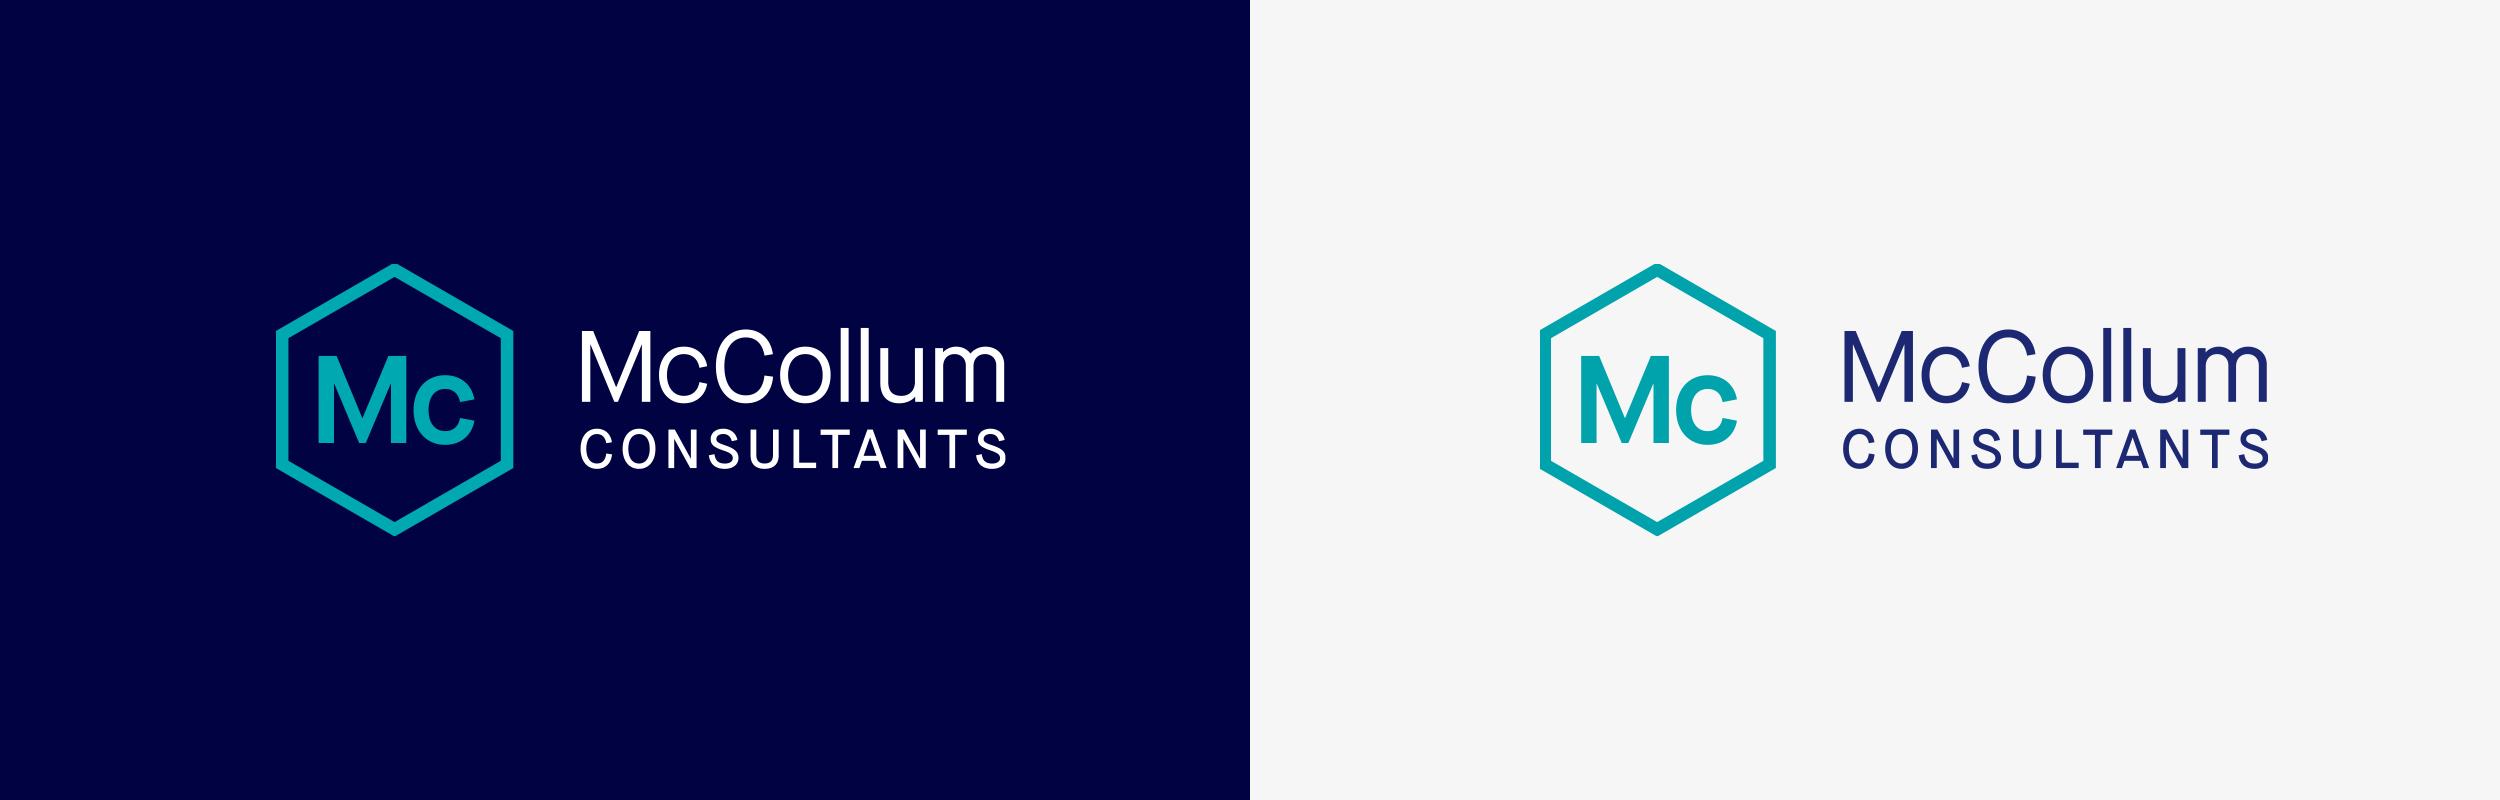 McCollum-Consultants-Logo-Pos-Neg.png